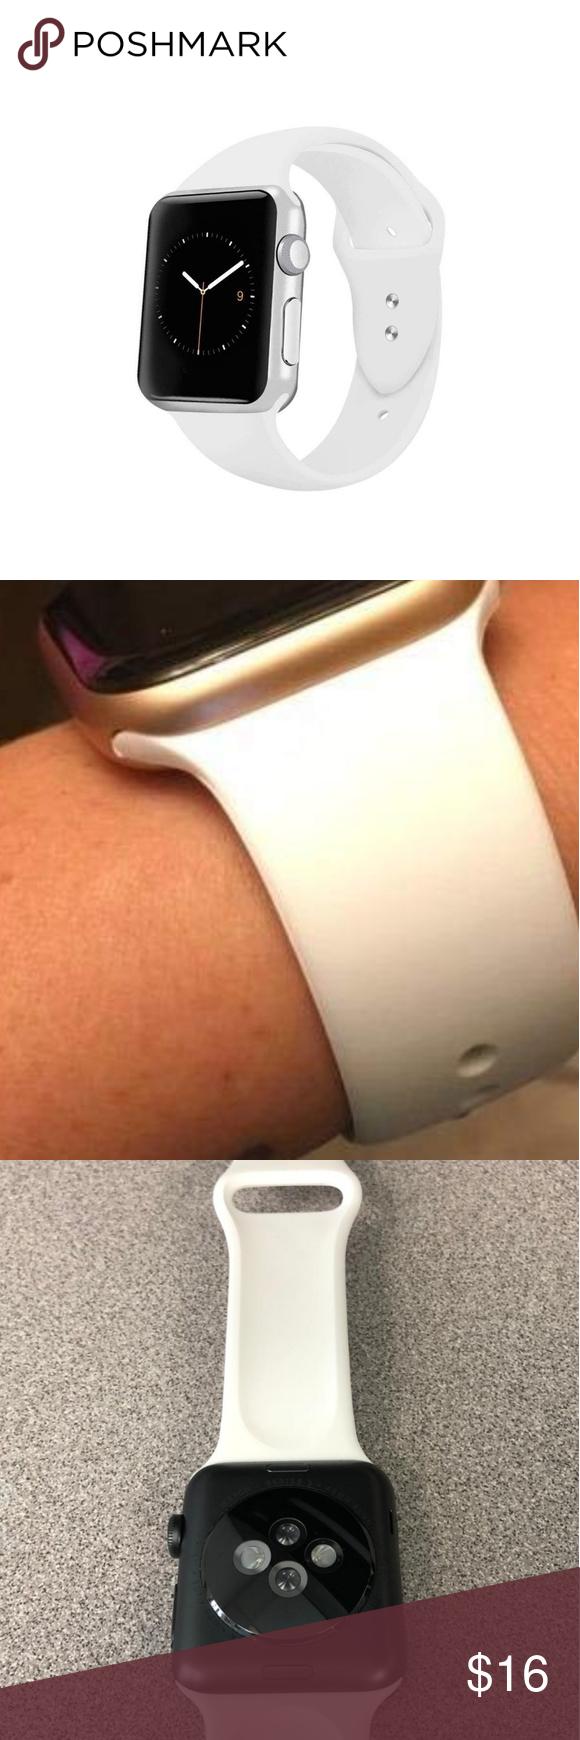 Apple Watch Band 42mm Igk